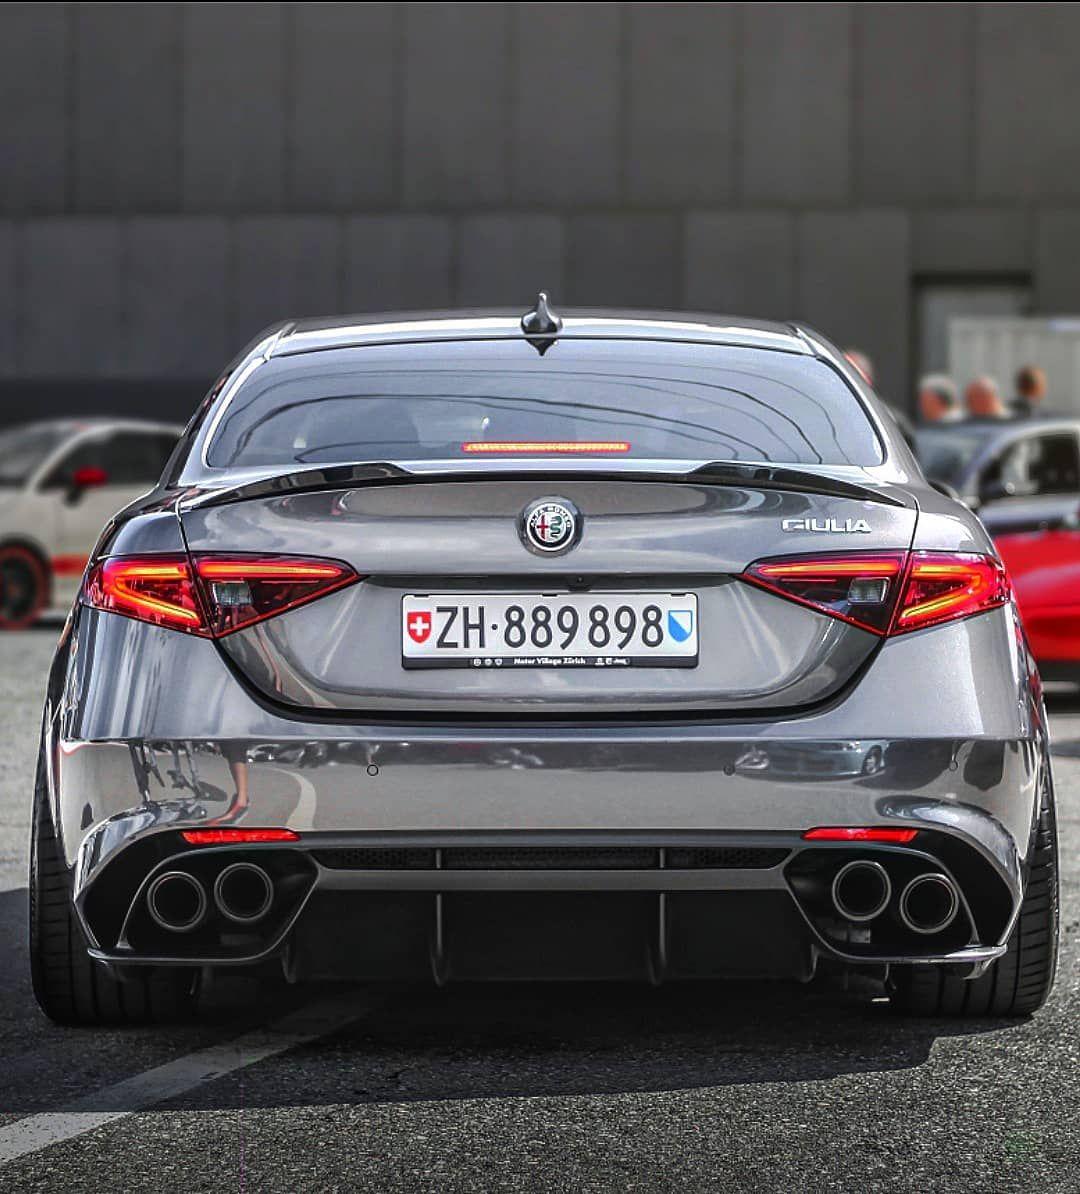 Alfa Giulia Qv >> Alfa Romeo Qv On Instagram She Has Not Exhausts She